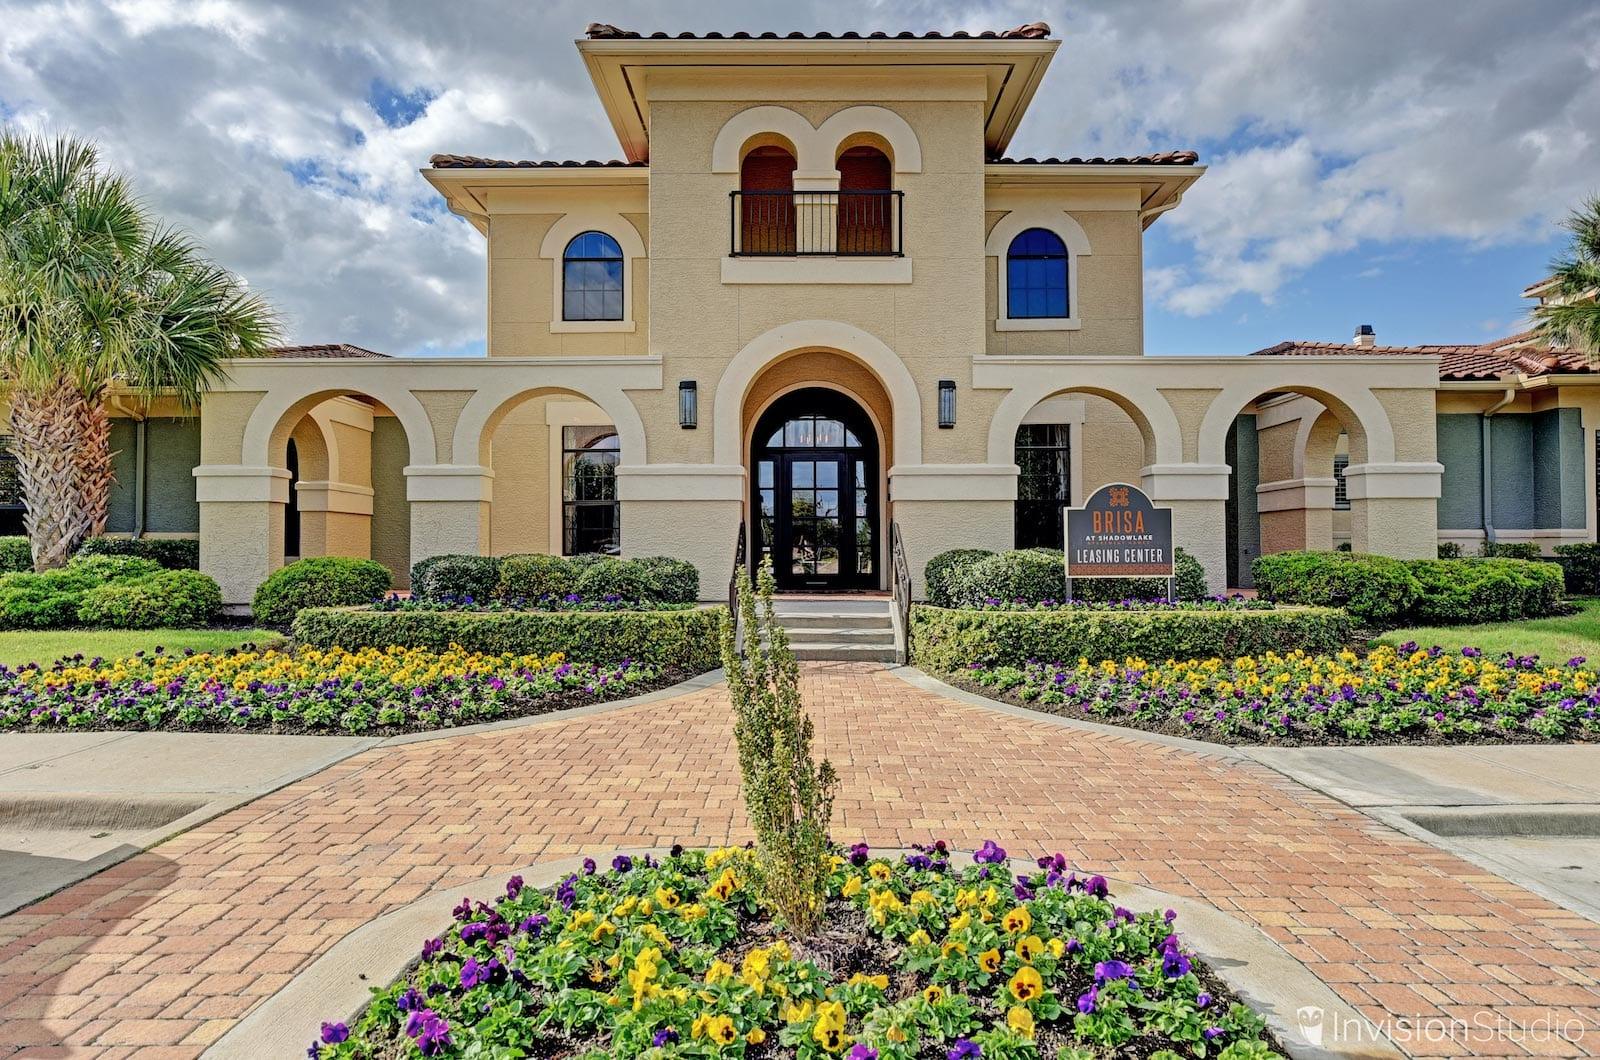 Anahiem Matterport 3D Tours | Anaheim Virtual Tour Photographer | Anaheim Aerial Photography Services | Anaheim HDR Real Estate Photography